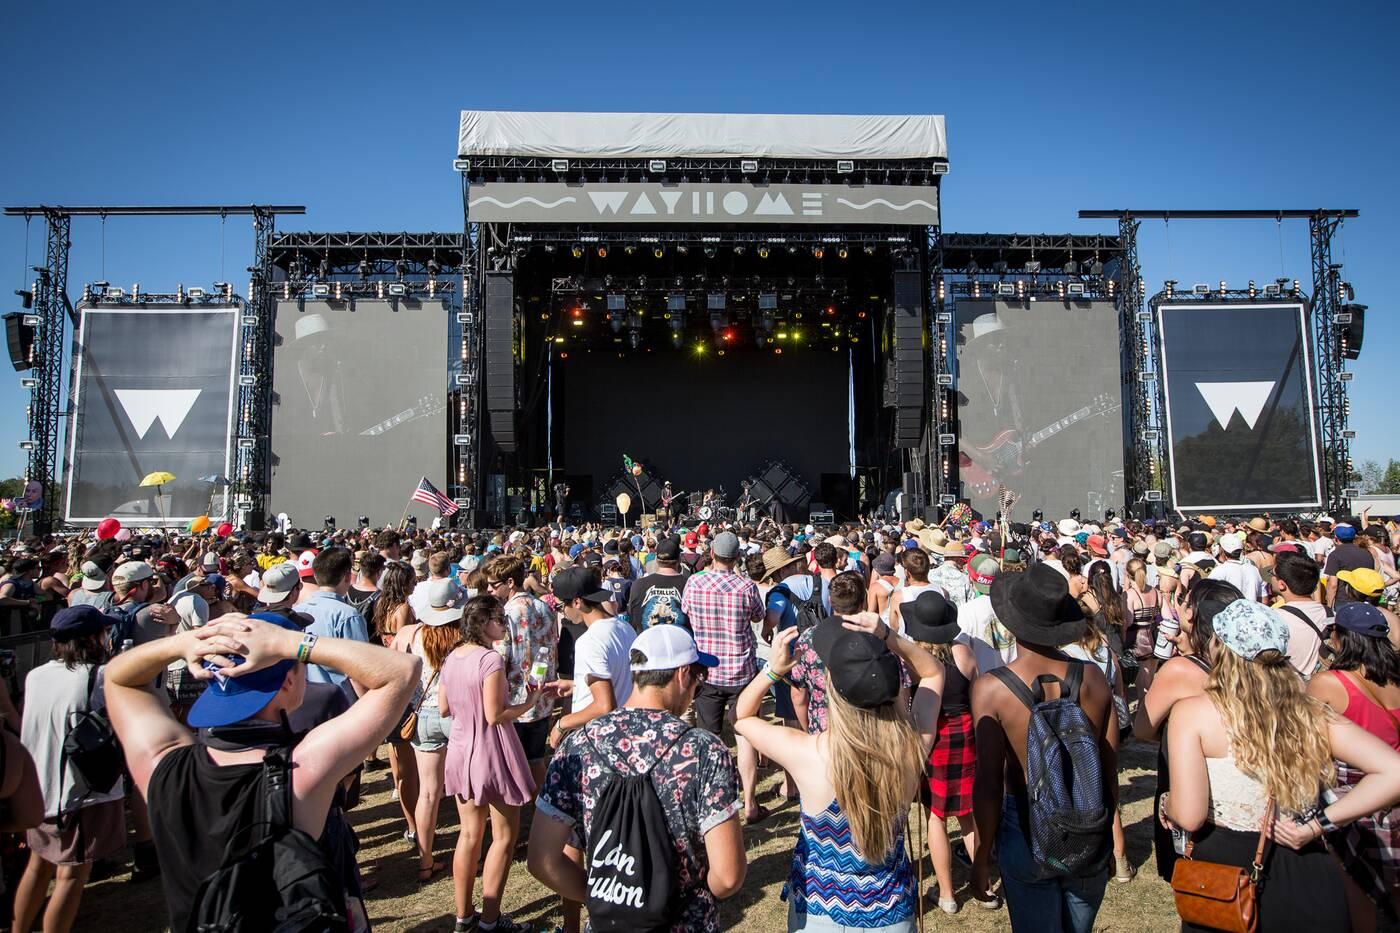 Wayhome music festival